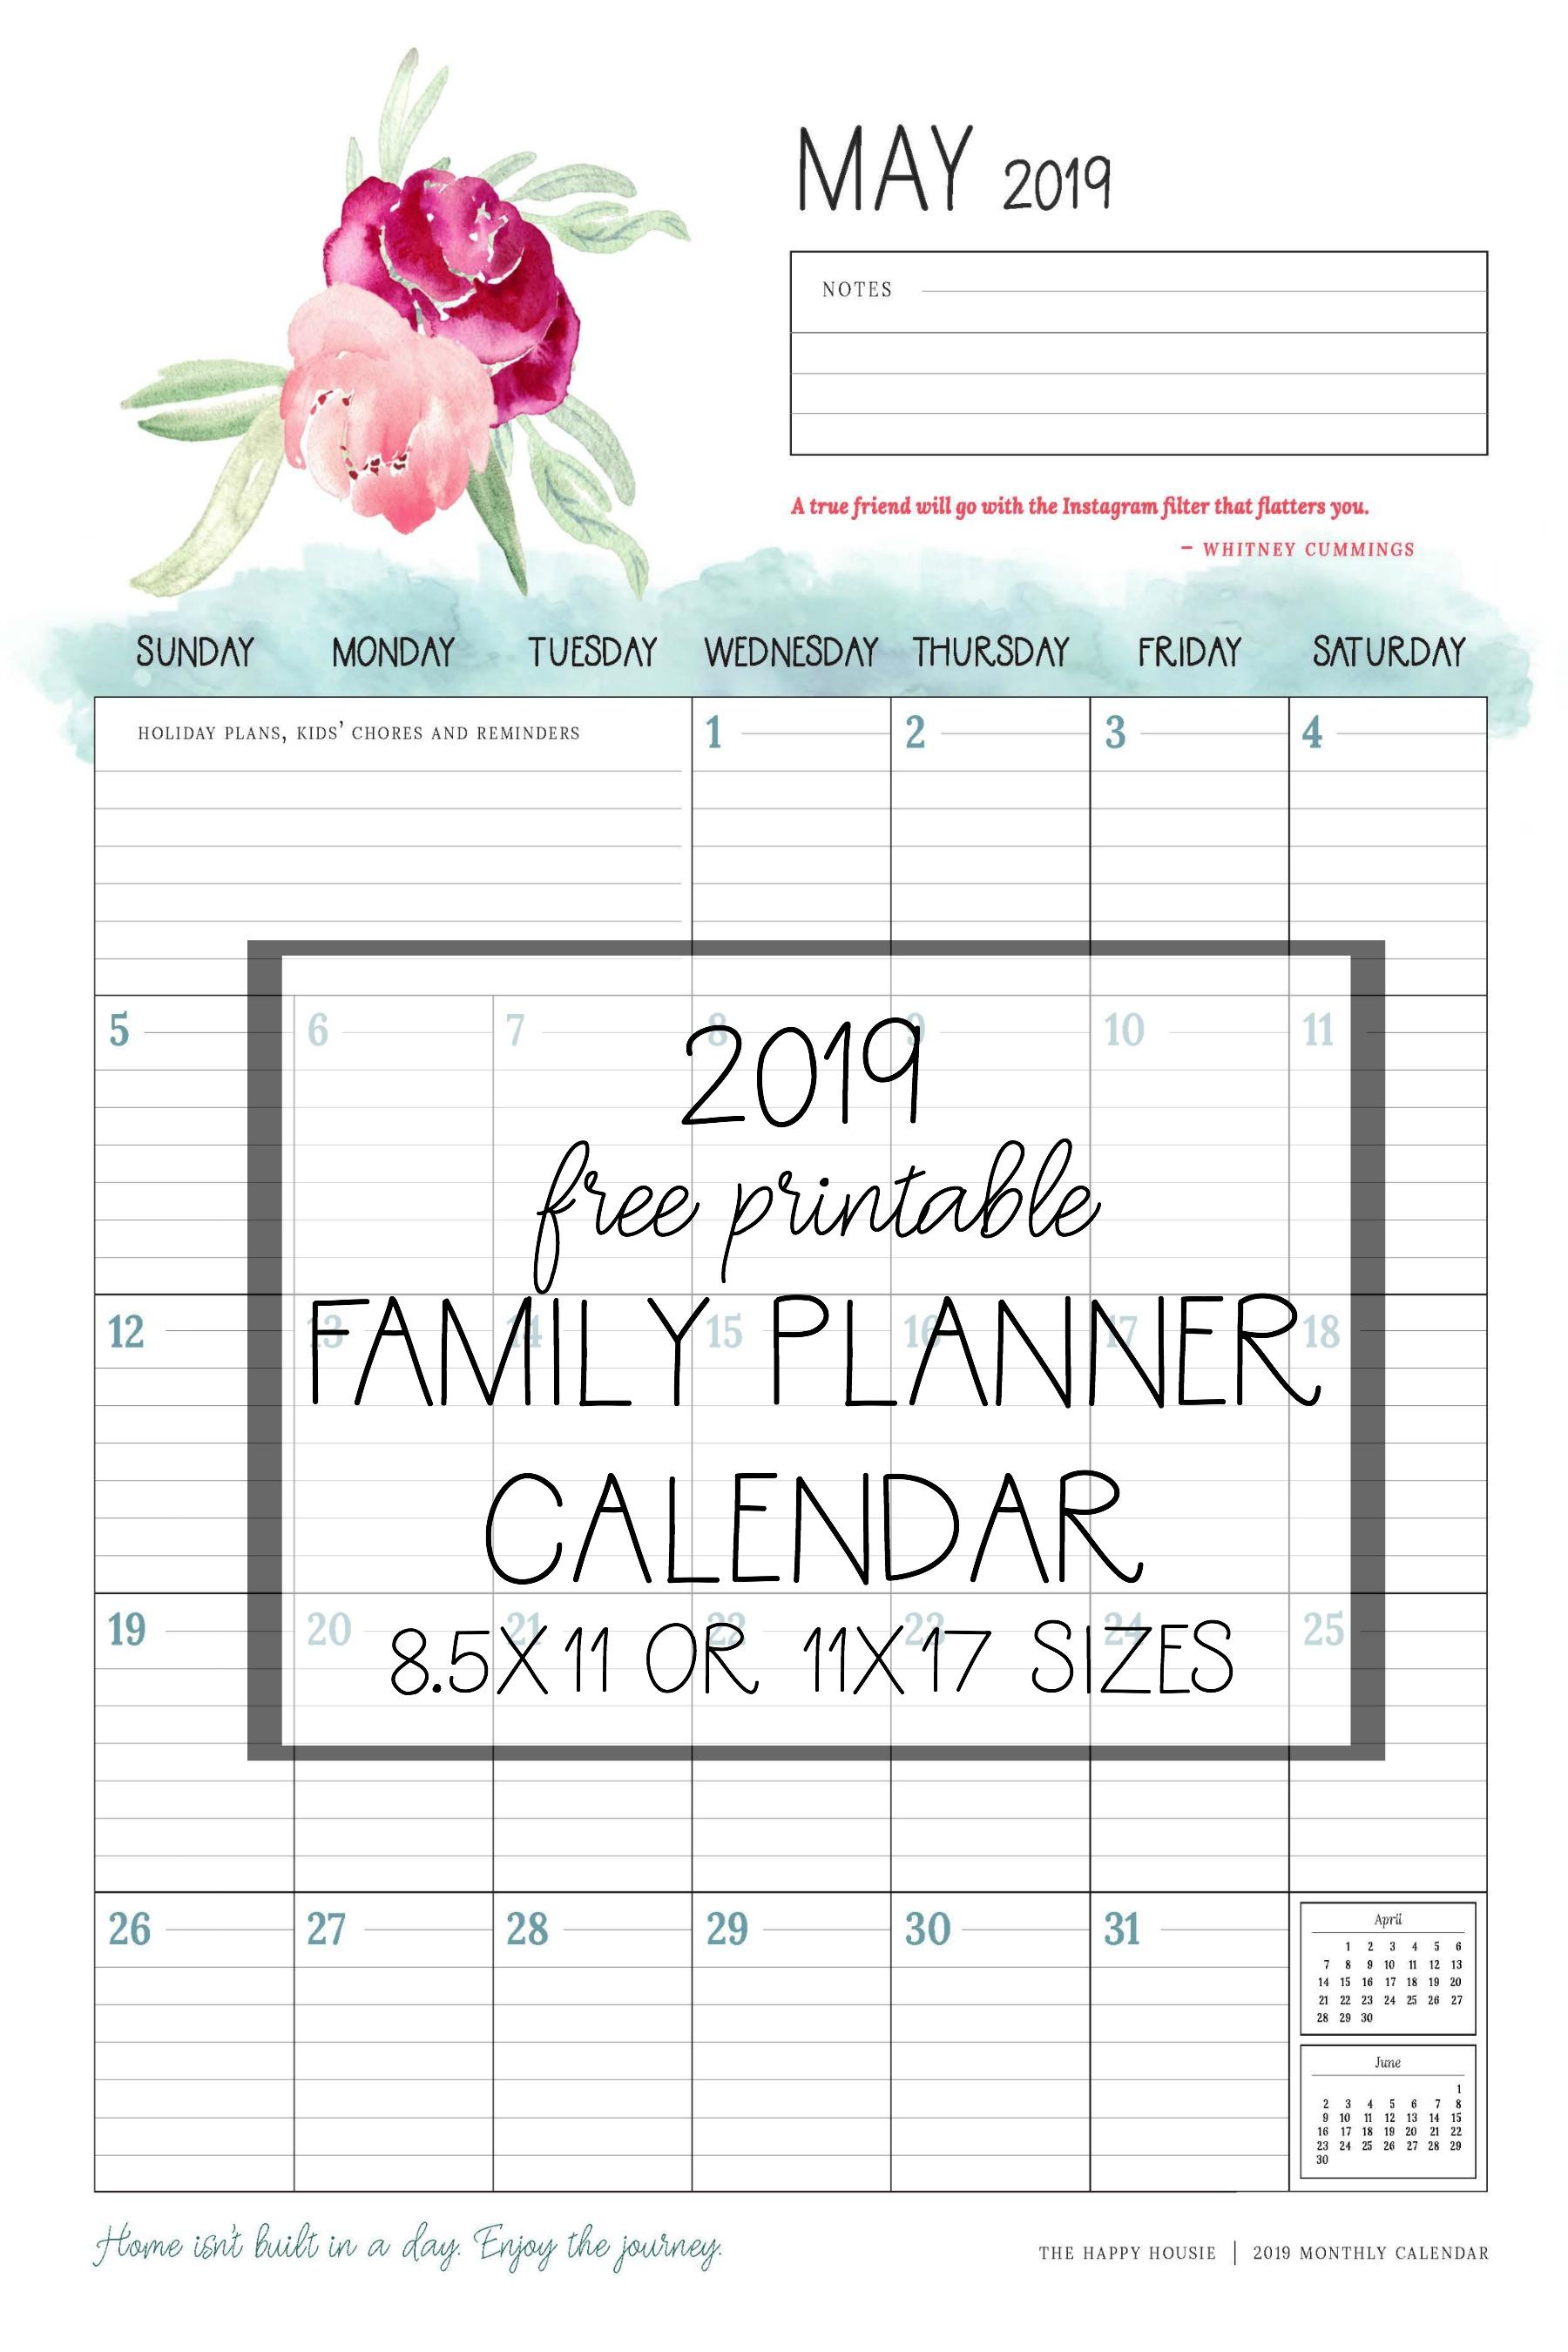 Free Printable Calendar Family Planner Organizer